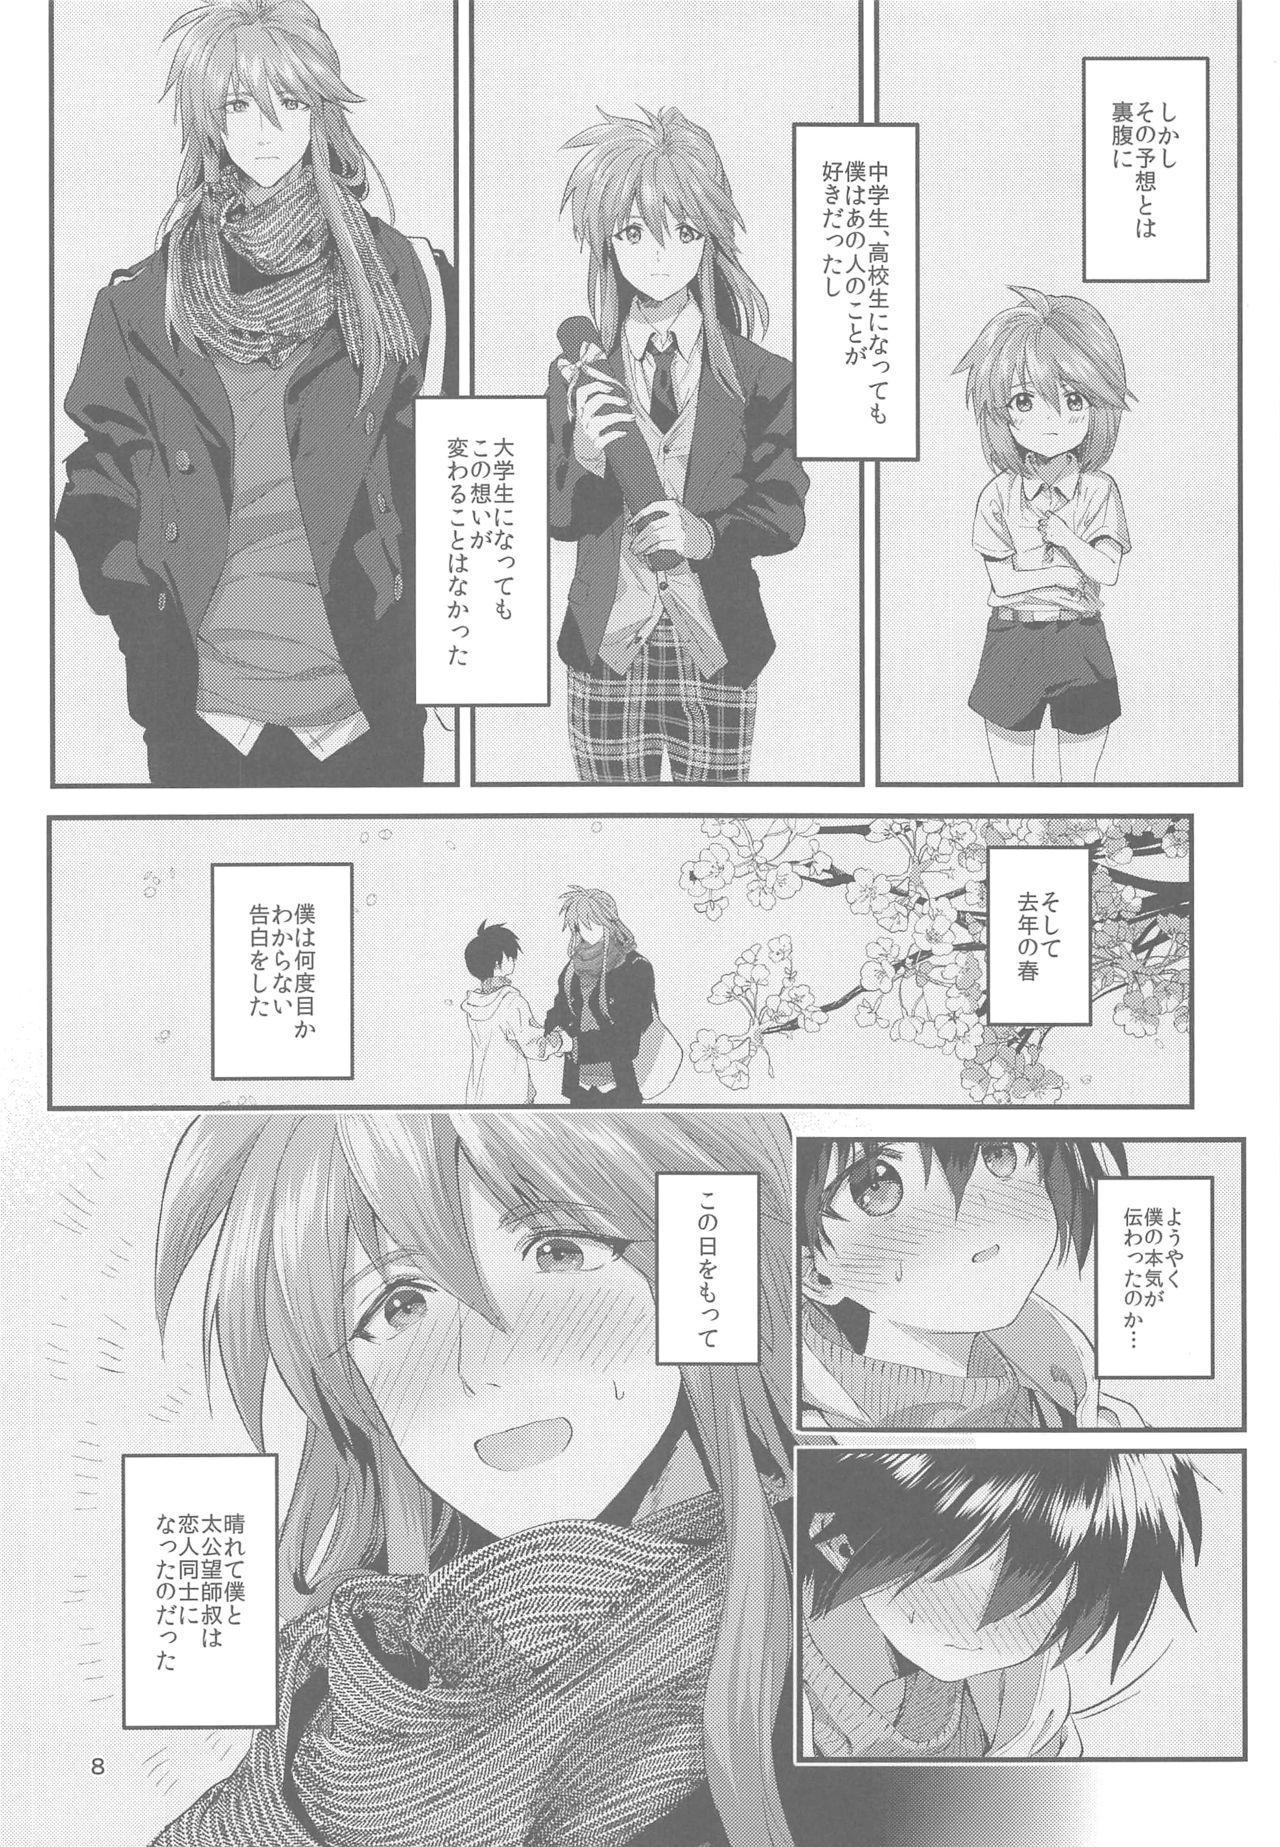 Anata ni Deaeta Shiawase ni 6